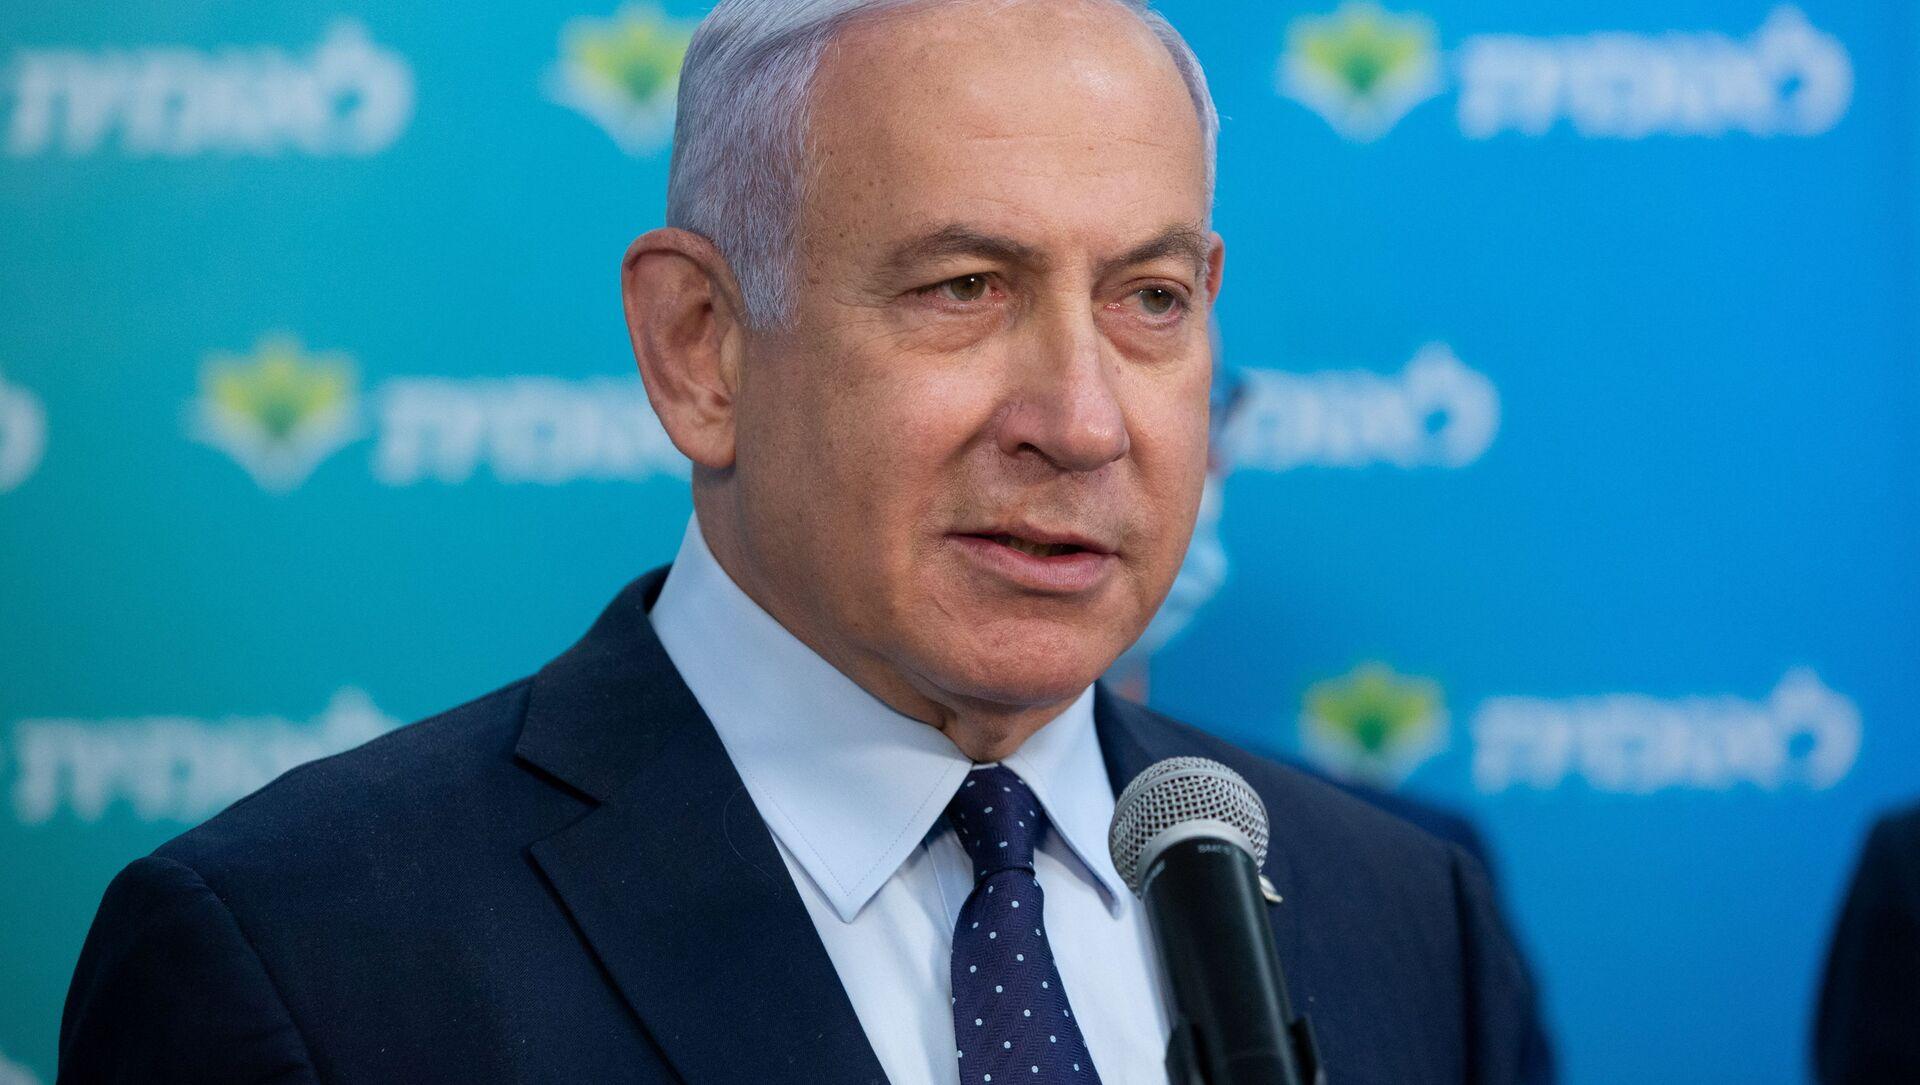 Premier Izraela Benjamin Netanjahu. - Sputnik Polska, 1920, 01.03.2021